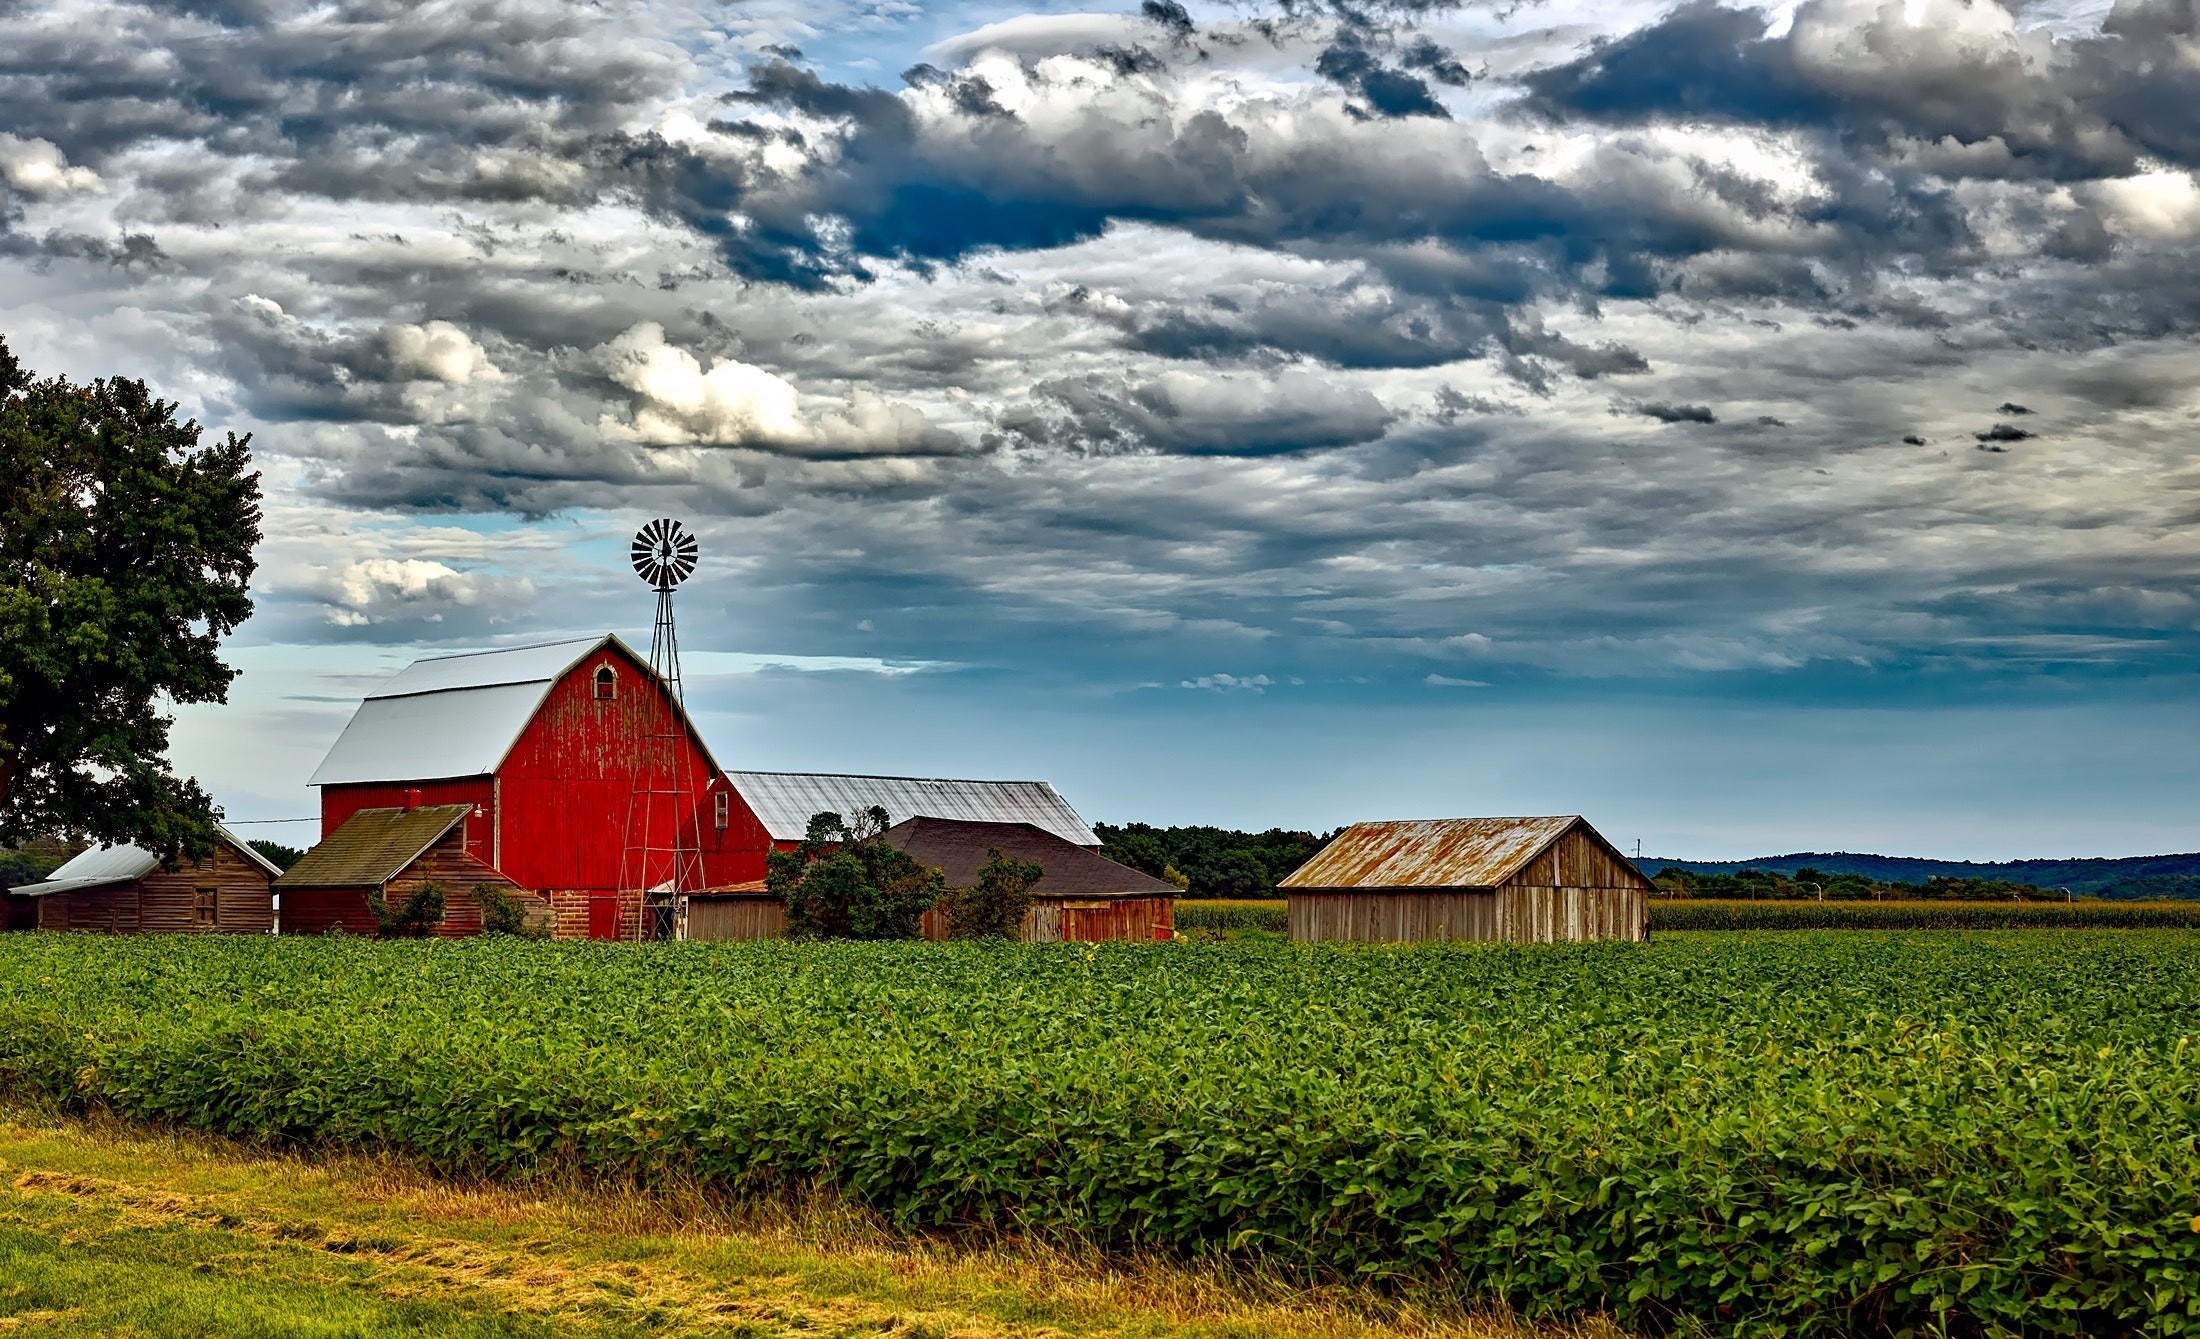 rural_agriculture-barn-buildings